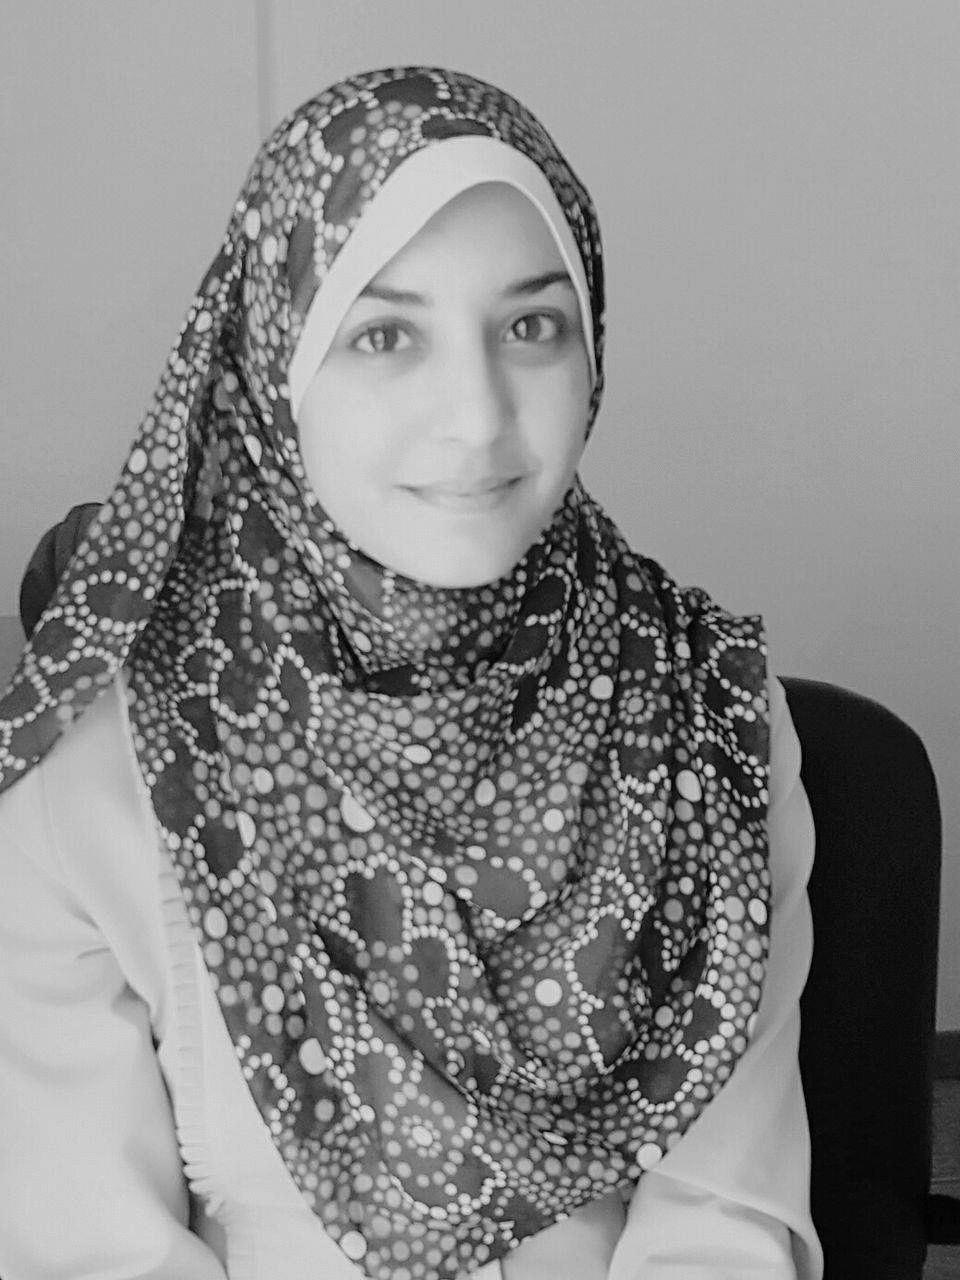 ياسمين هشام المصري Headshot